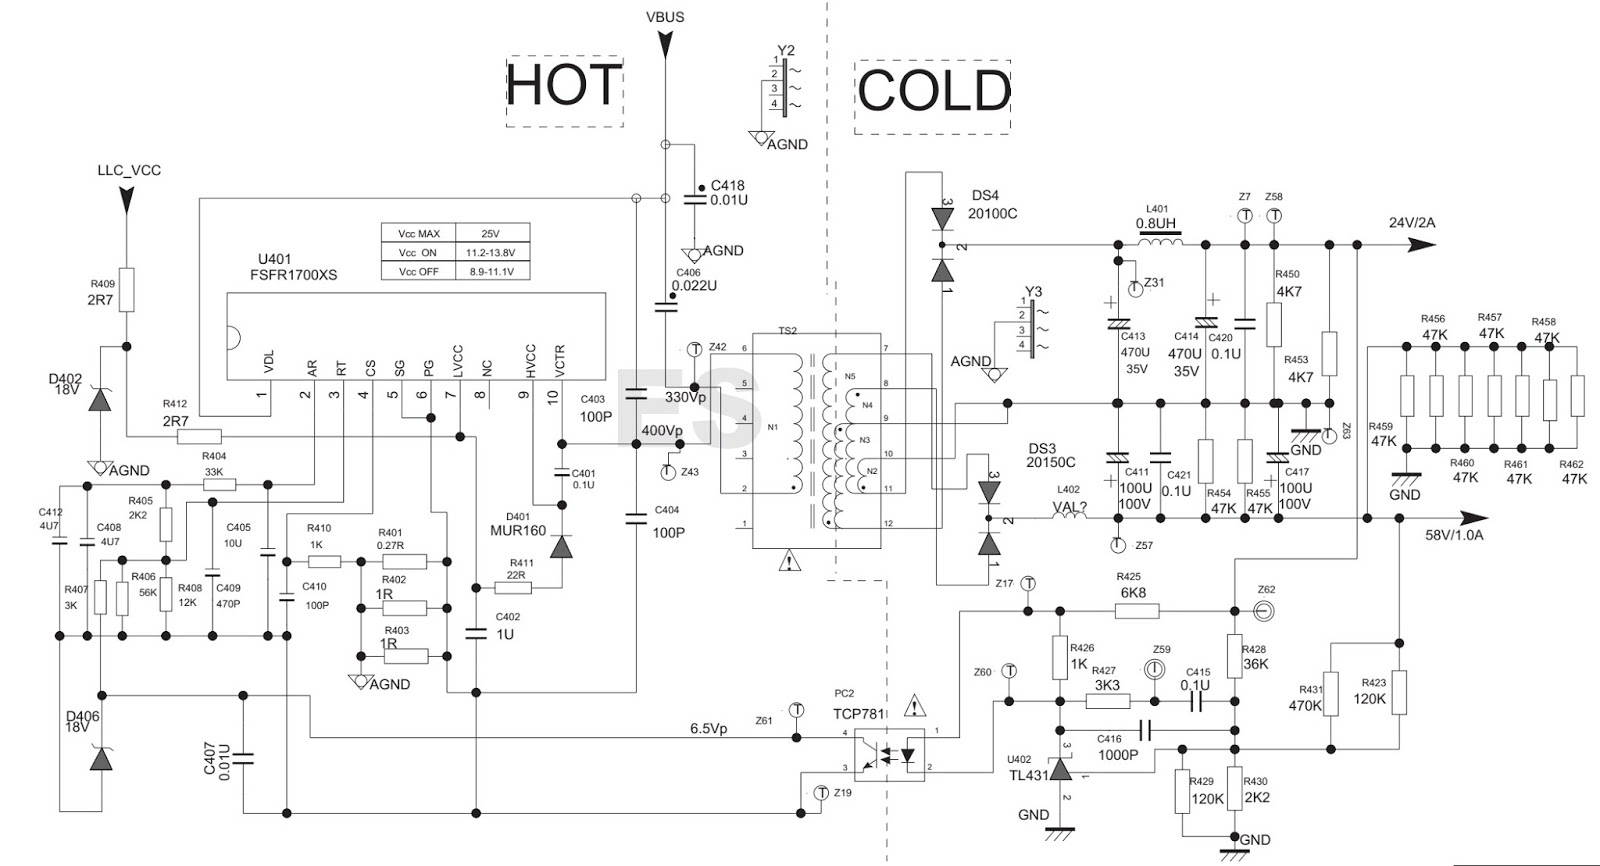 smps schematic diagram 3000gt headlight wiring firmware download tcl 40 e371c4 pwa1xg power